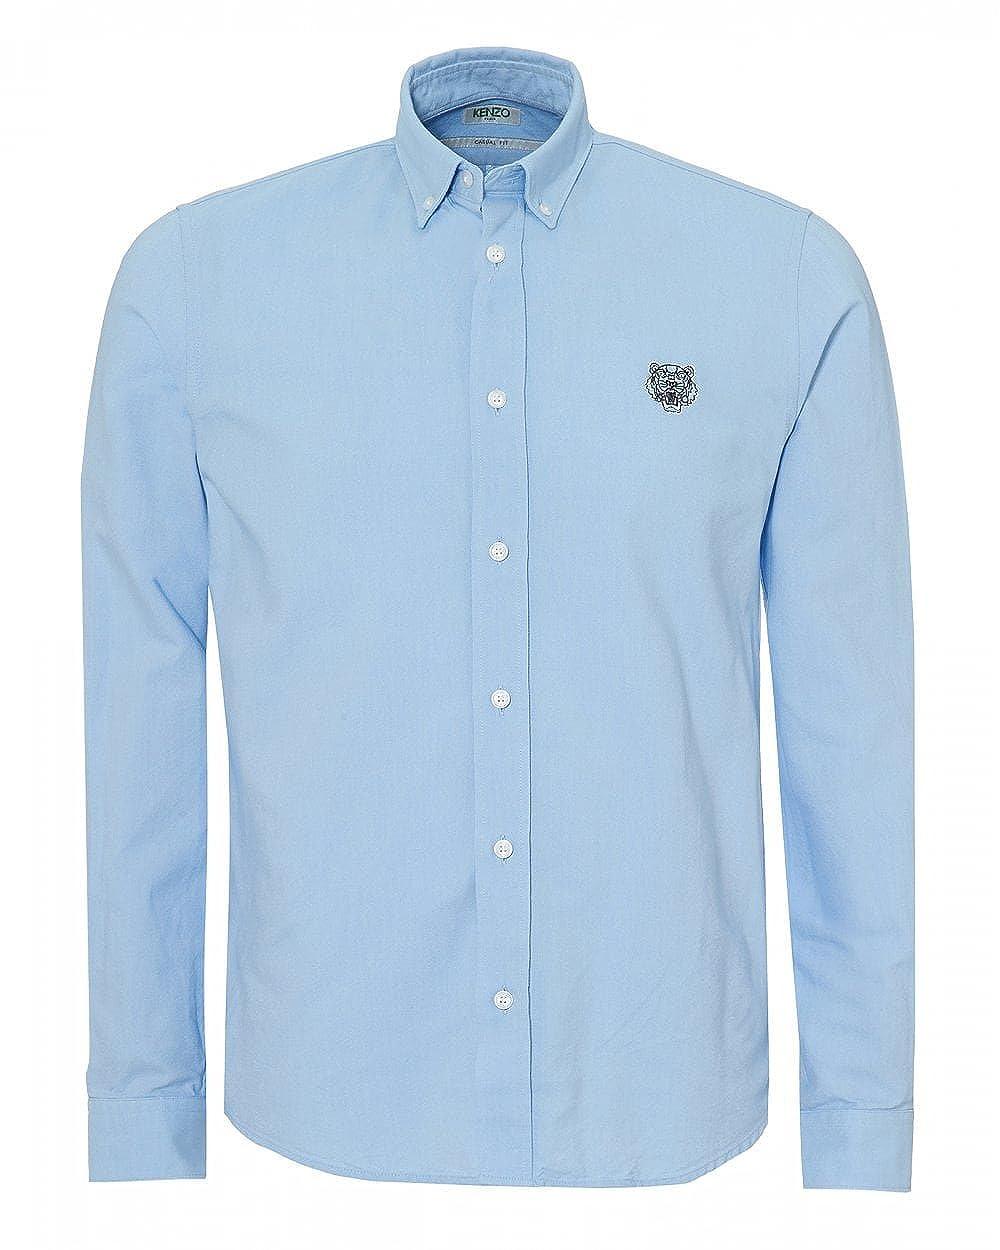 9391984060 Kenzo Mens Tiger Crest Slim Fit Shirt: Amazon.co.uk: Clothing